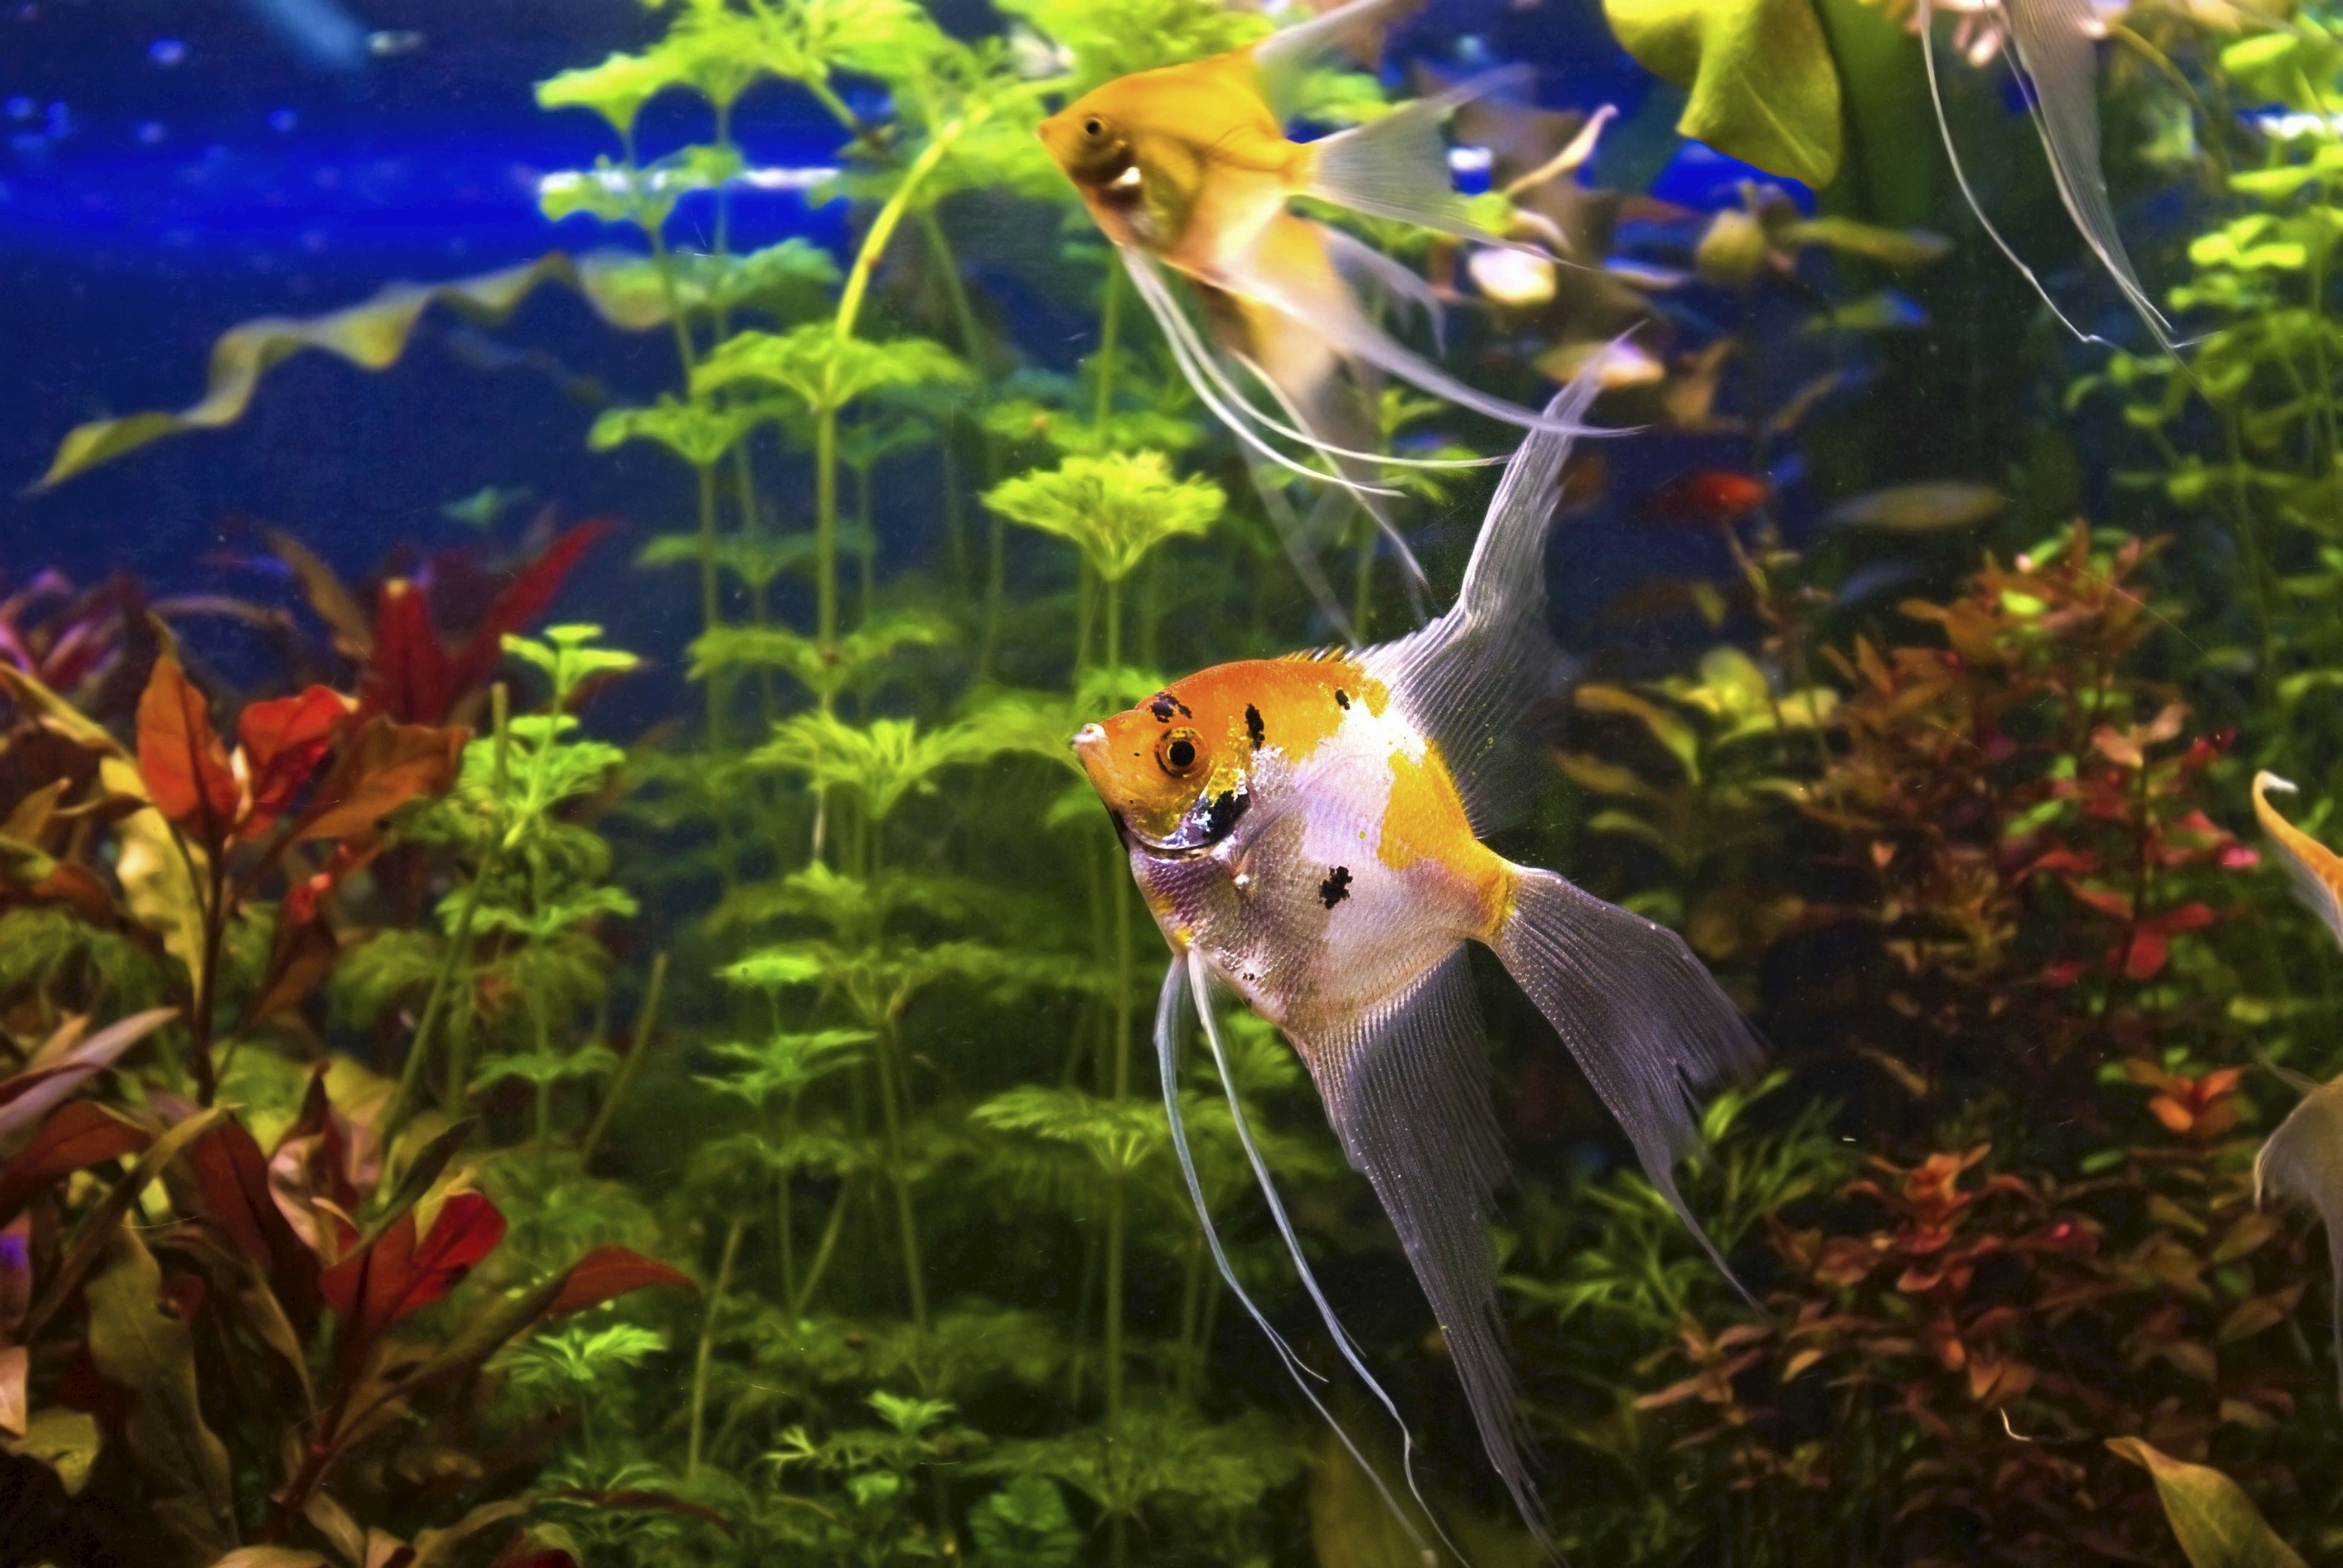 WallpaperFusion-angelfish-Original-3872x2592.jpg